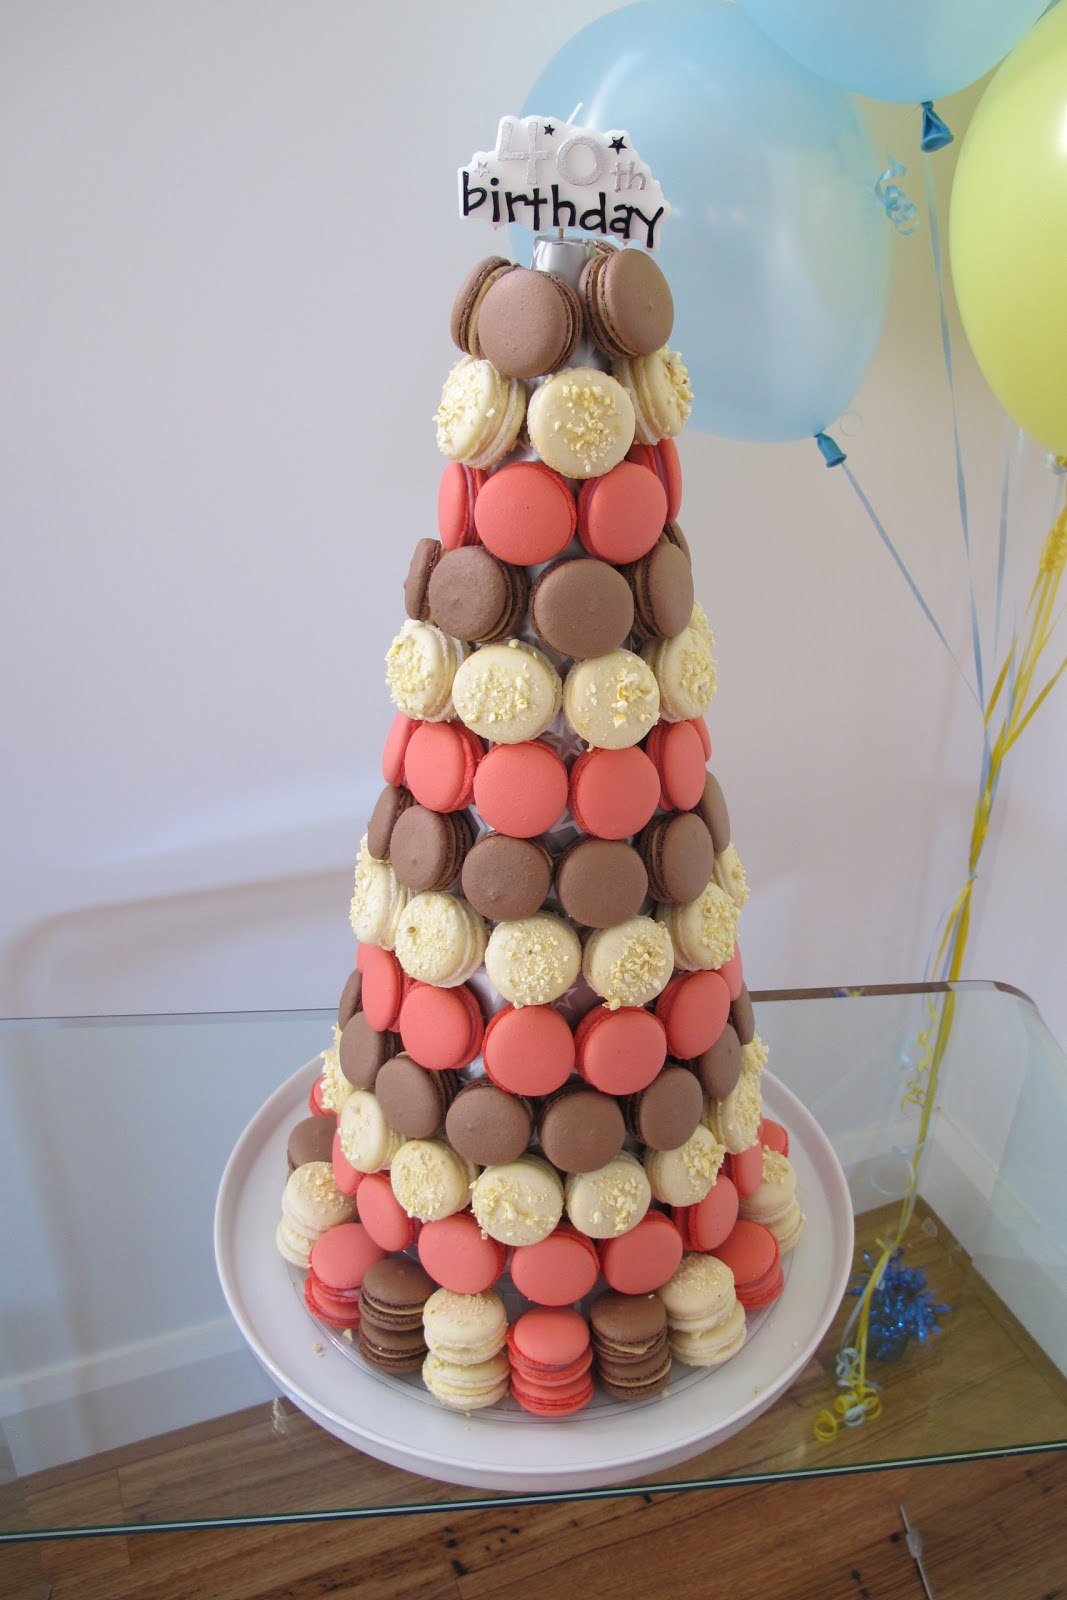 Alphie in the Kitchen: Zumbo-style macaron tower